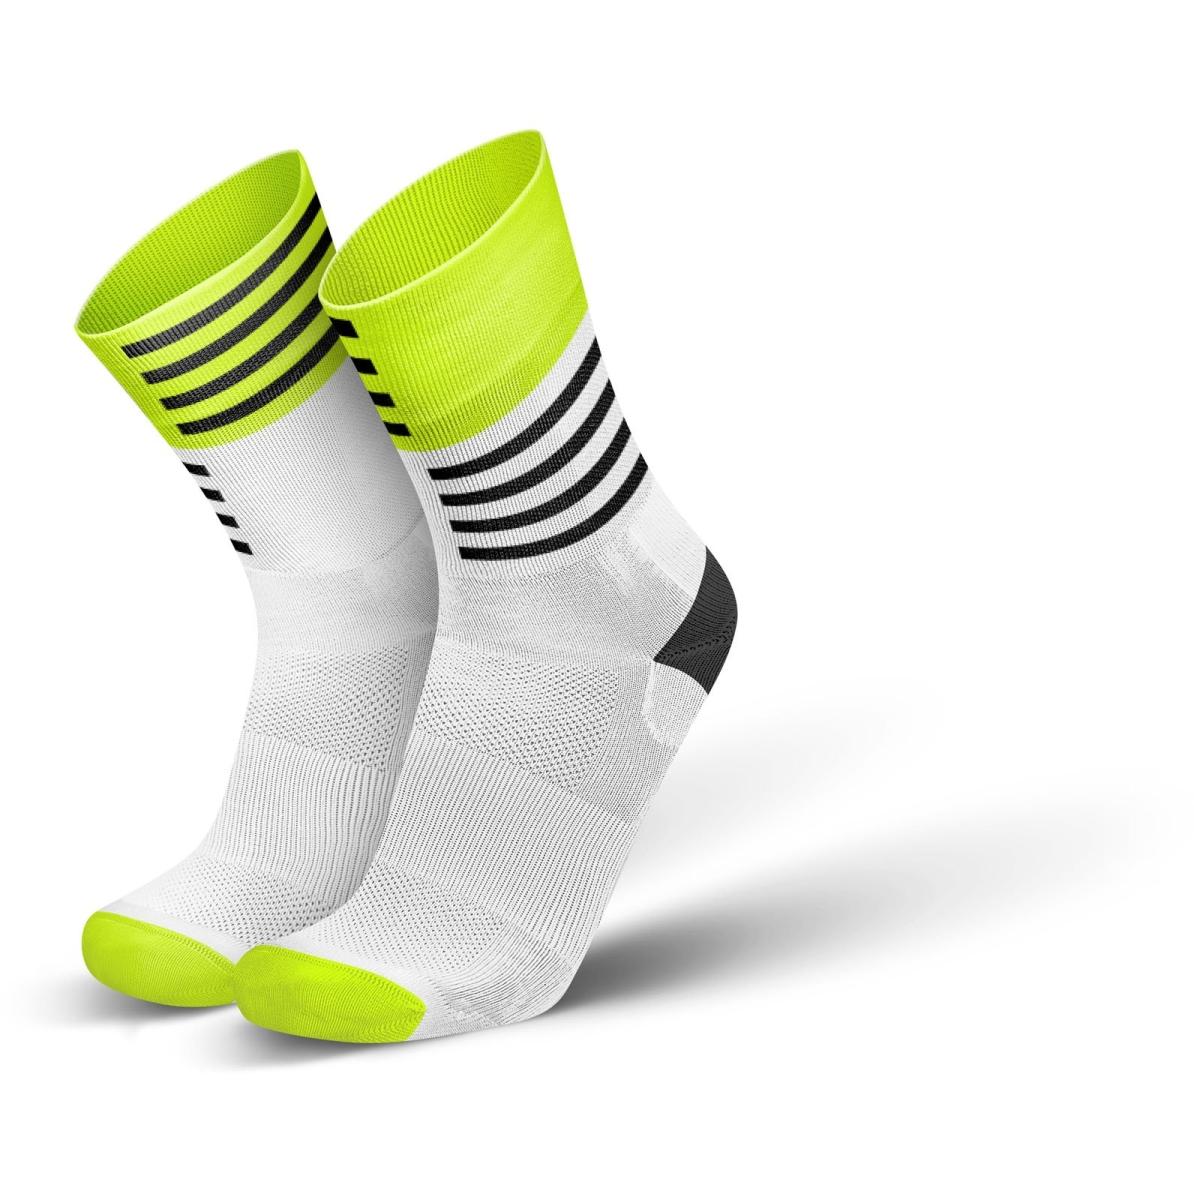 Produktbild von INCYLENCE Ultralight Wings Socken - White Canary